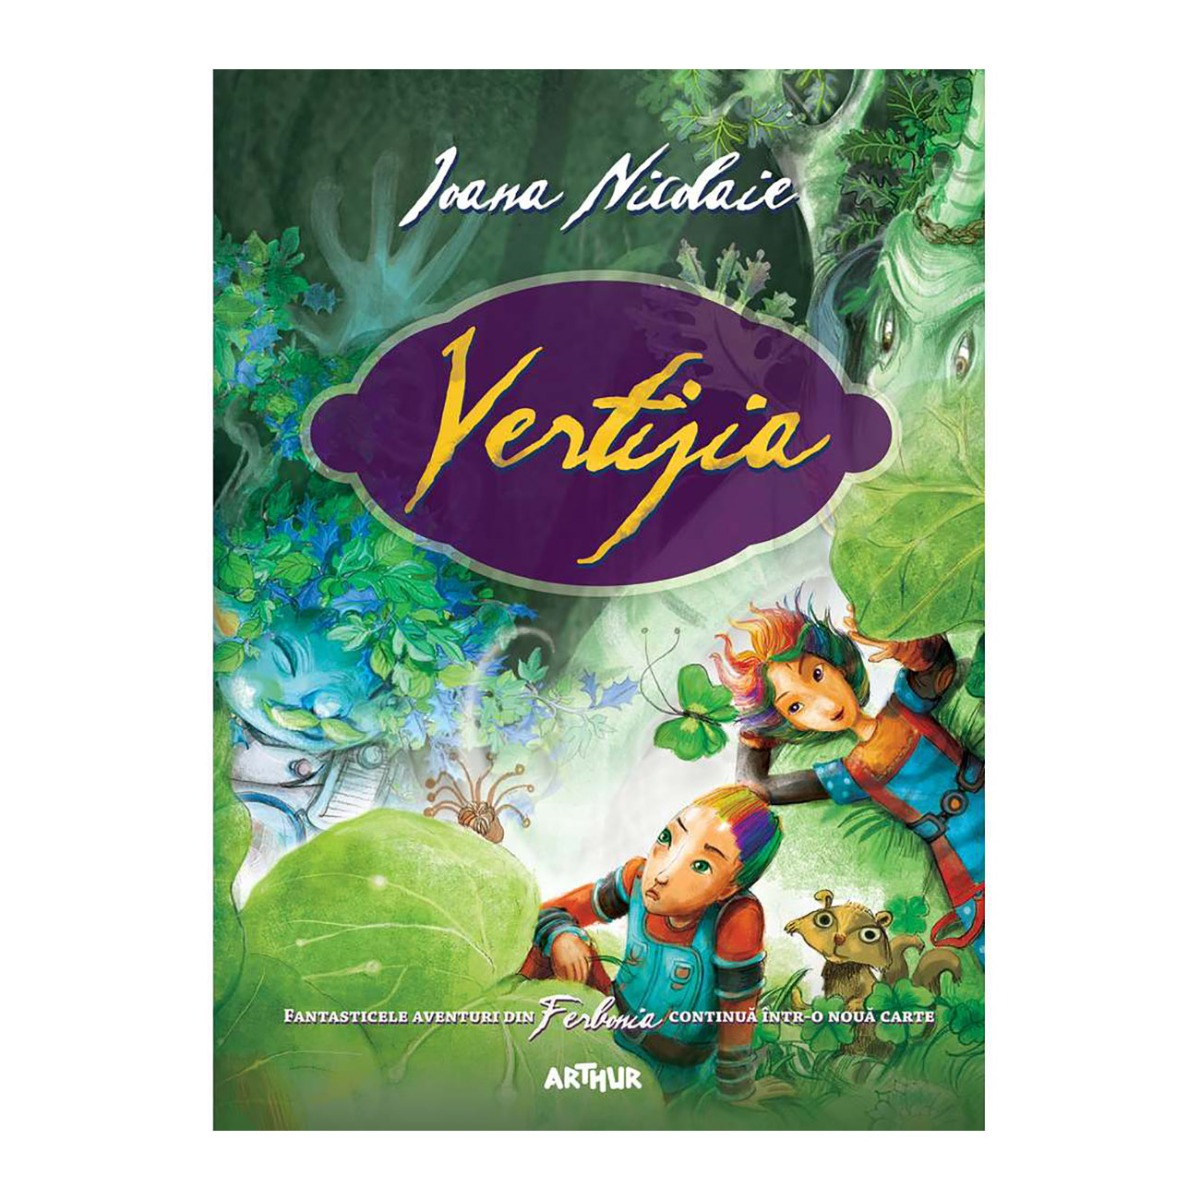 Carte Editura Arthur, Vertijia, Ioana Nicolaie